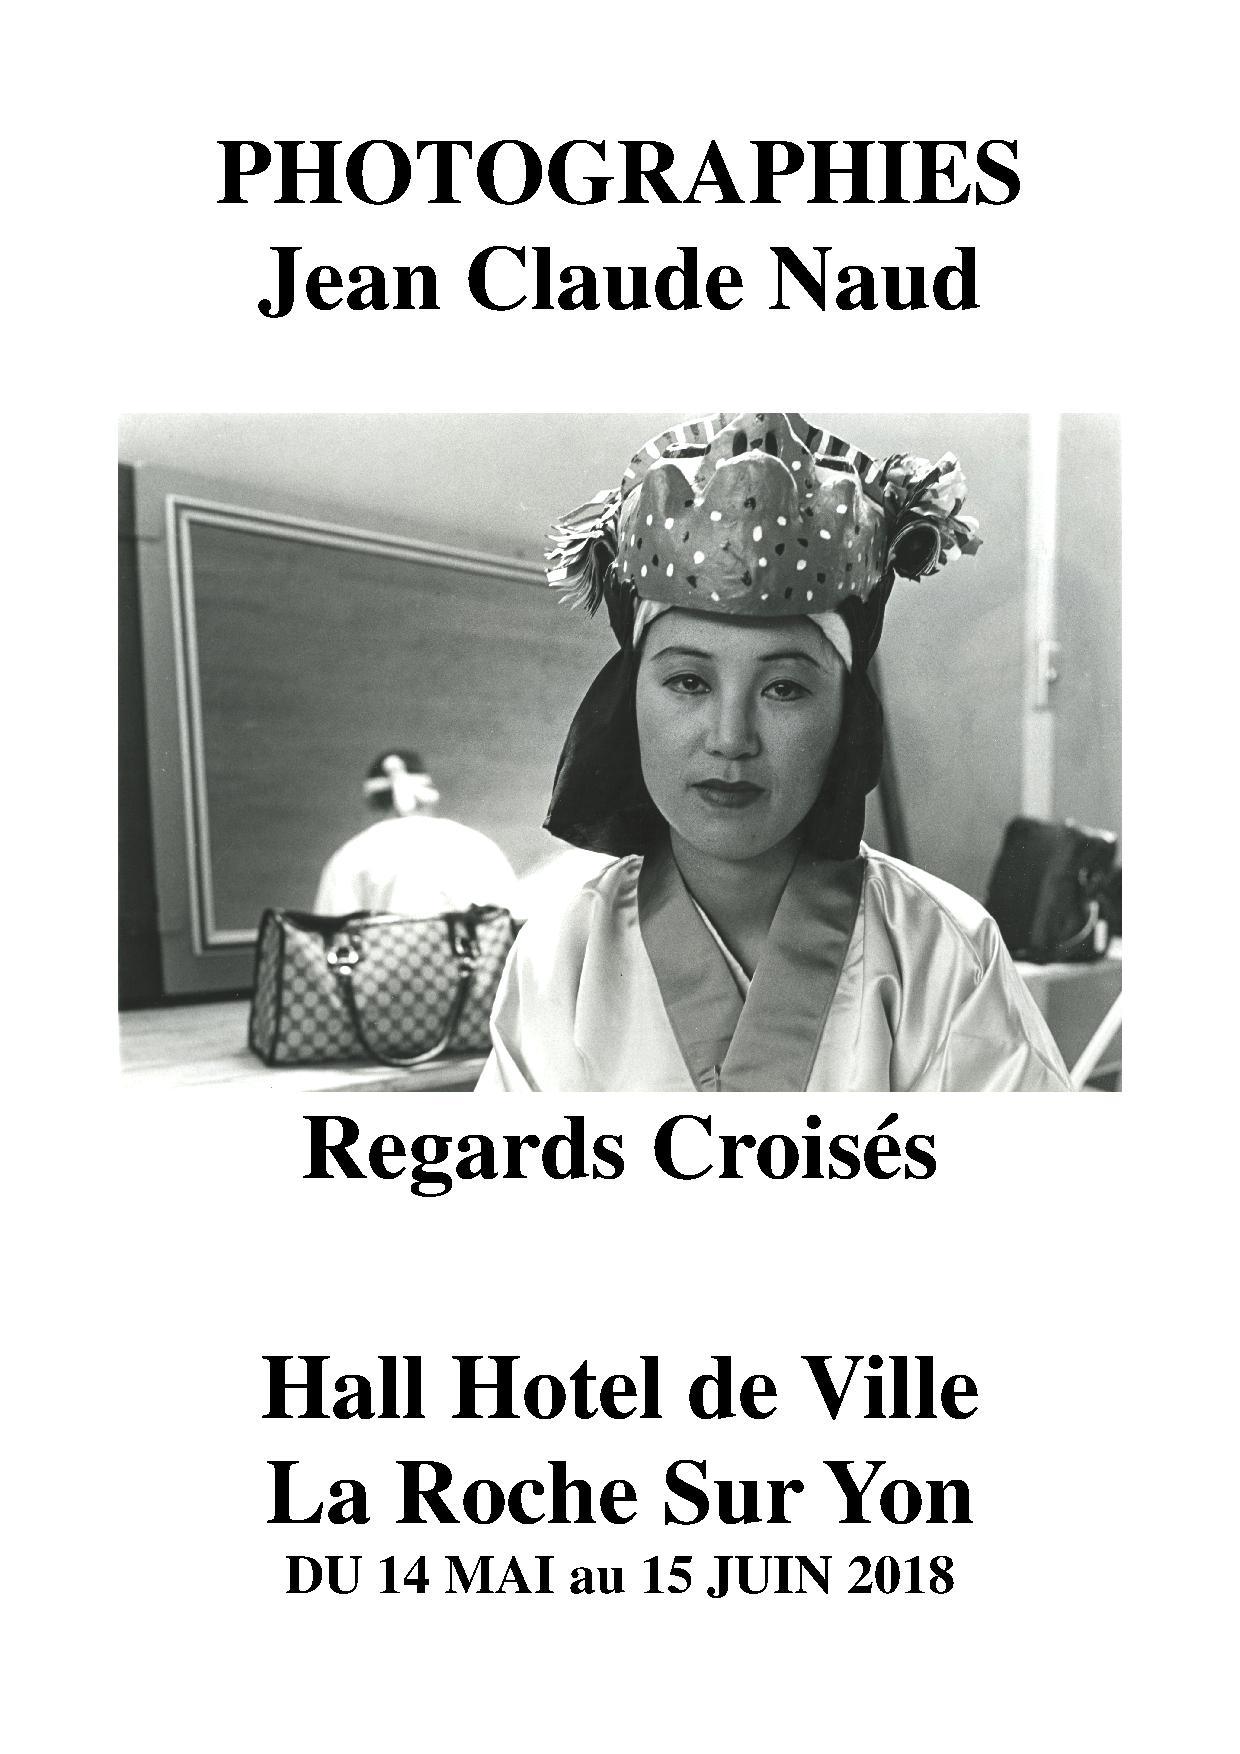 Regards croisés - Jean-Claude Naud Jc10